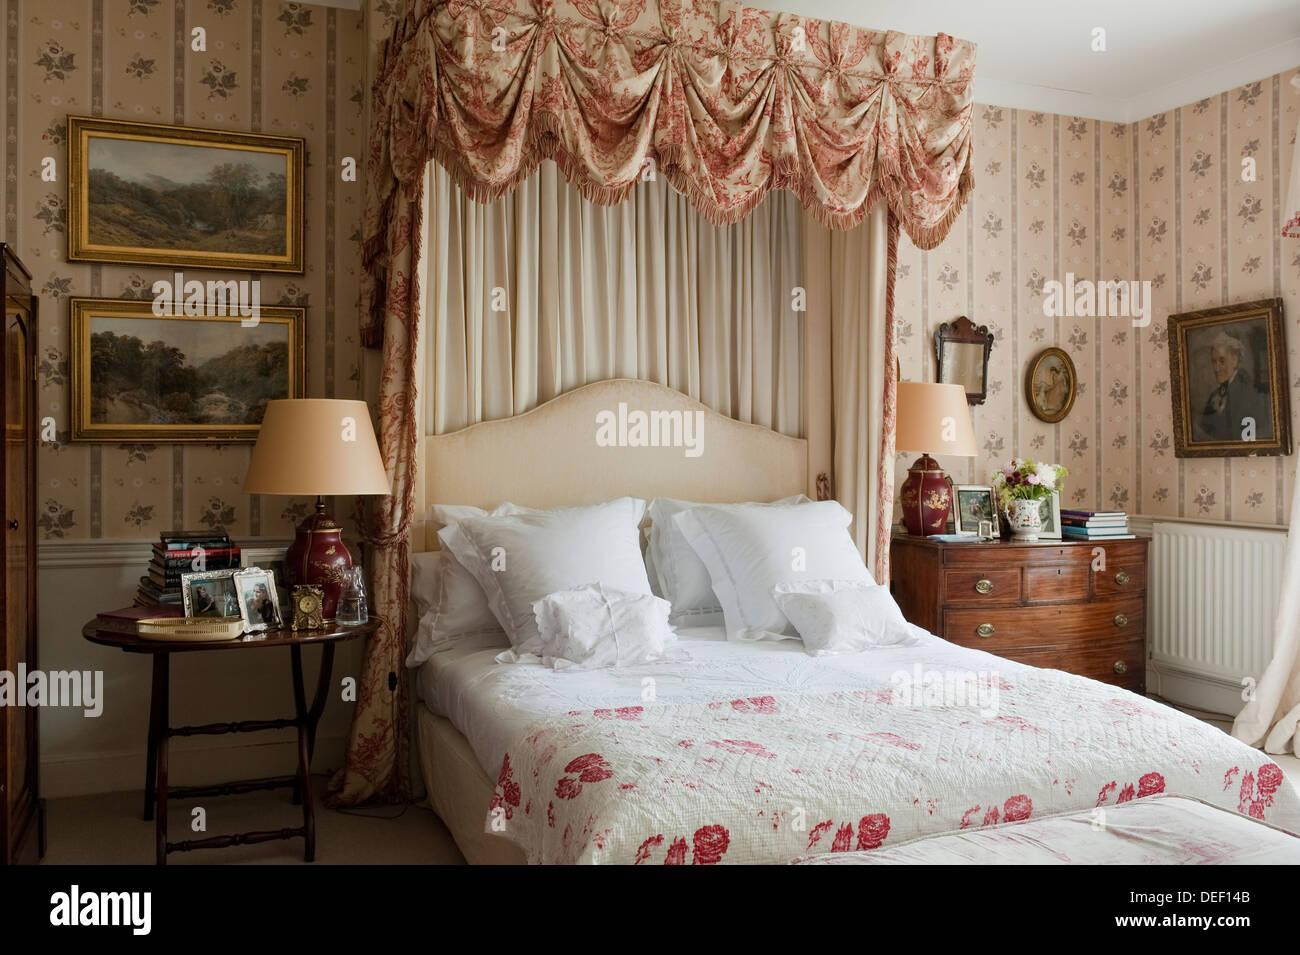 Farmhouse Bedroom With Fabric Pelmet Stock Photo Alamy